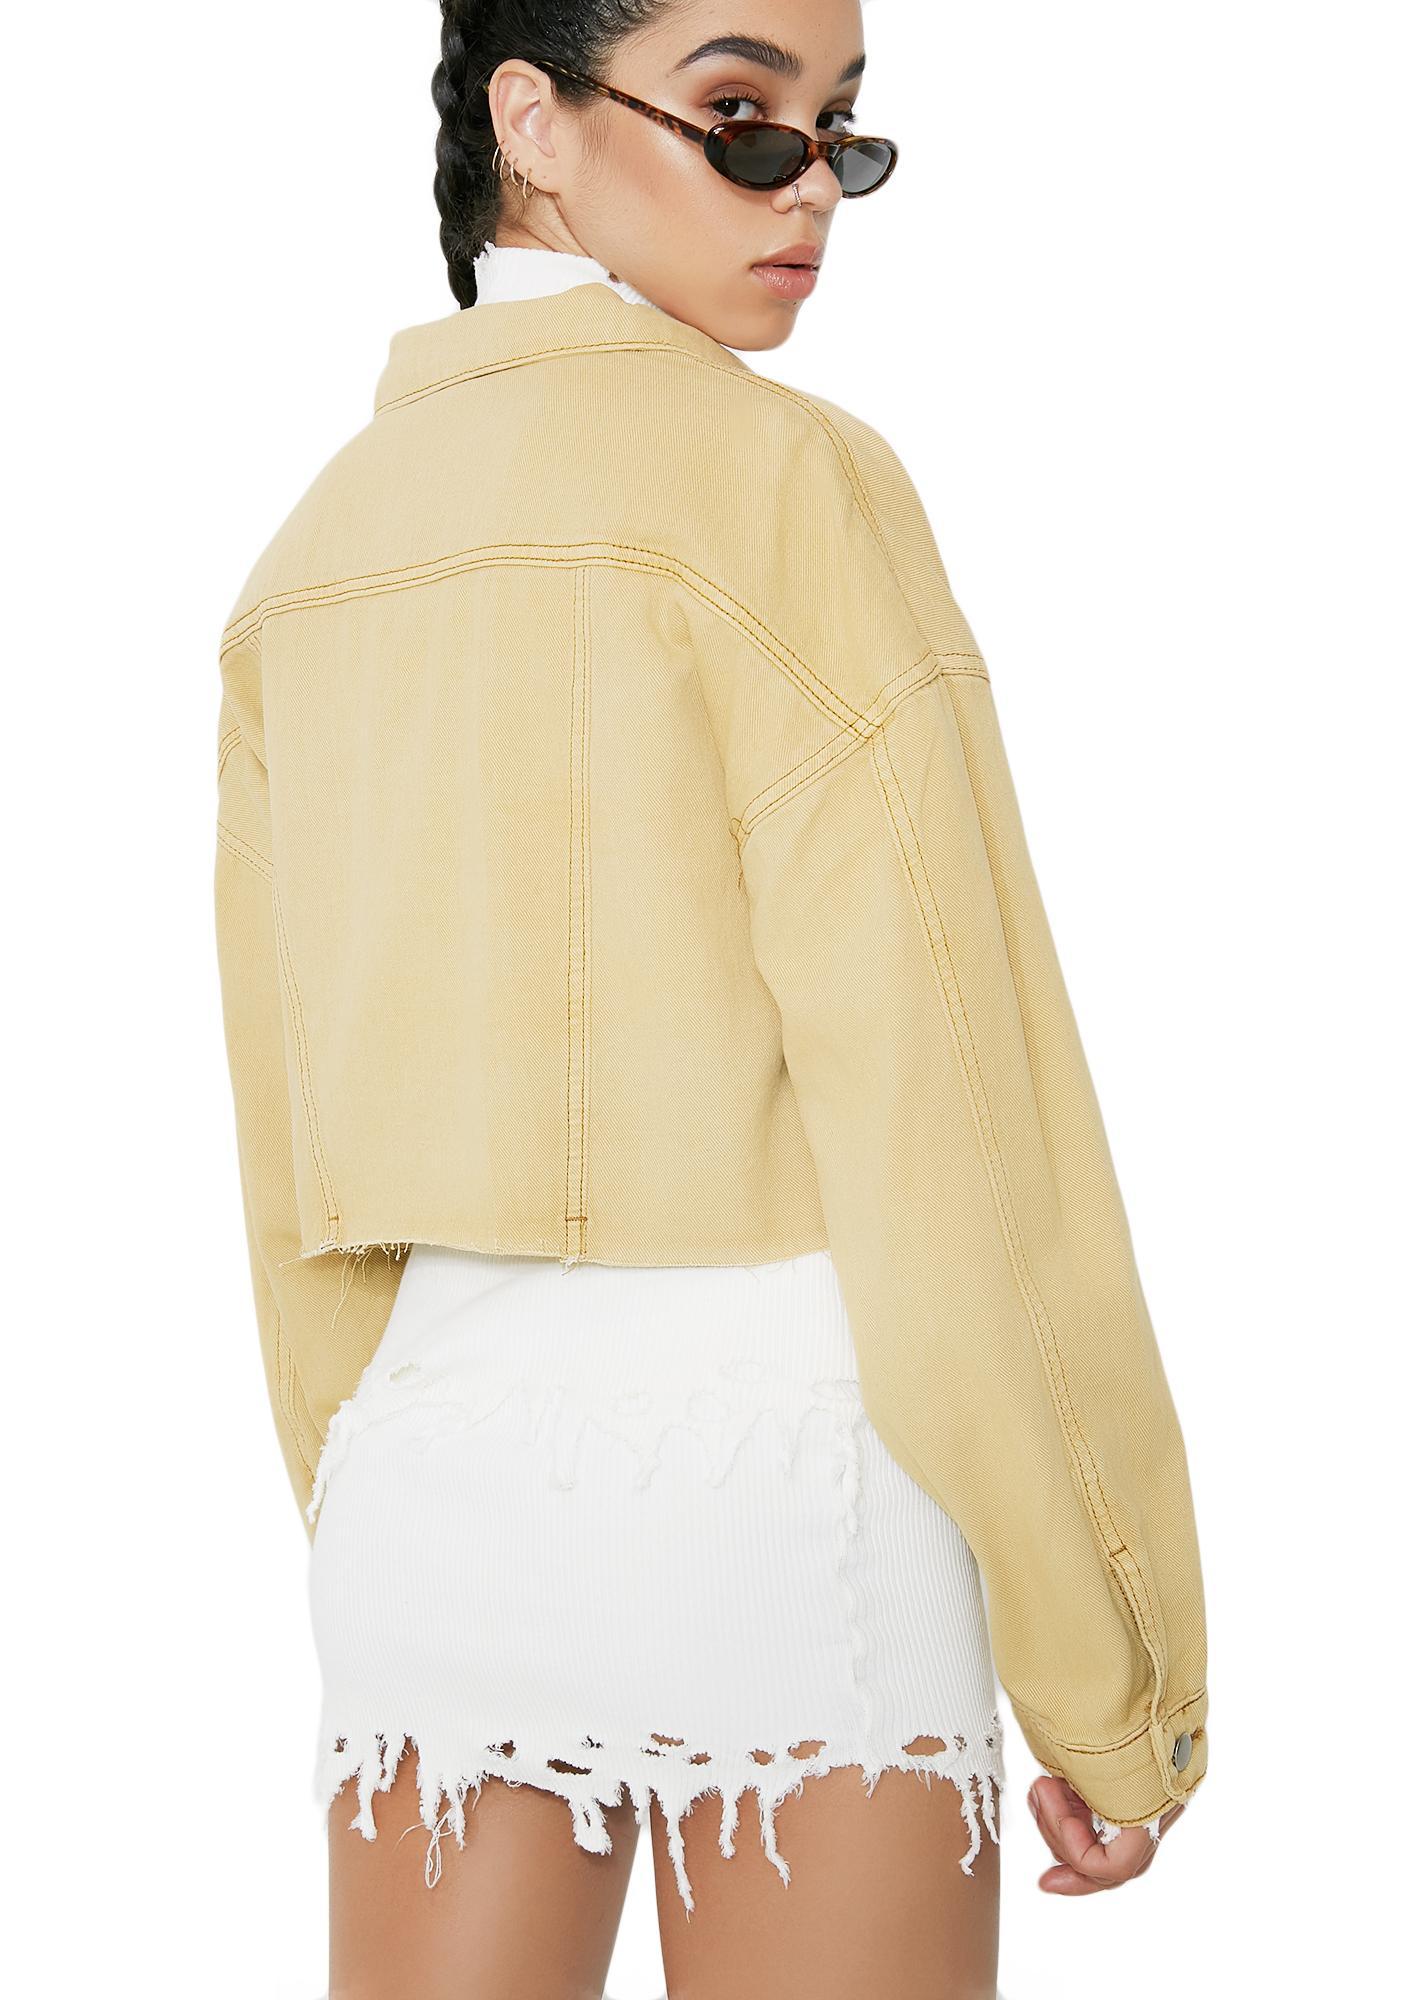 My Prerogative Cropped Jacket